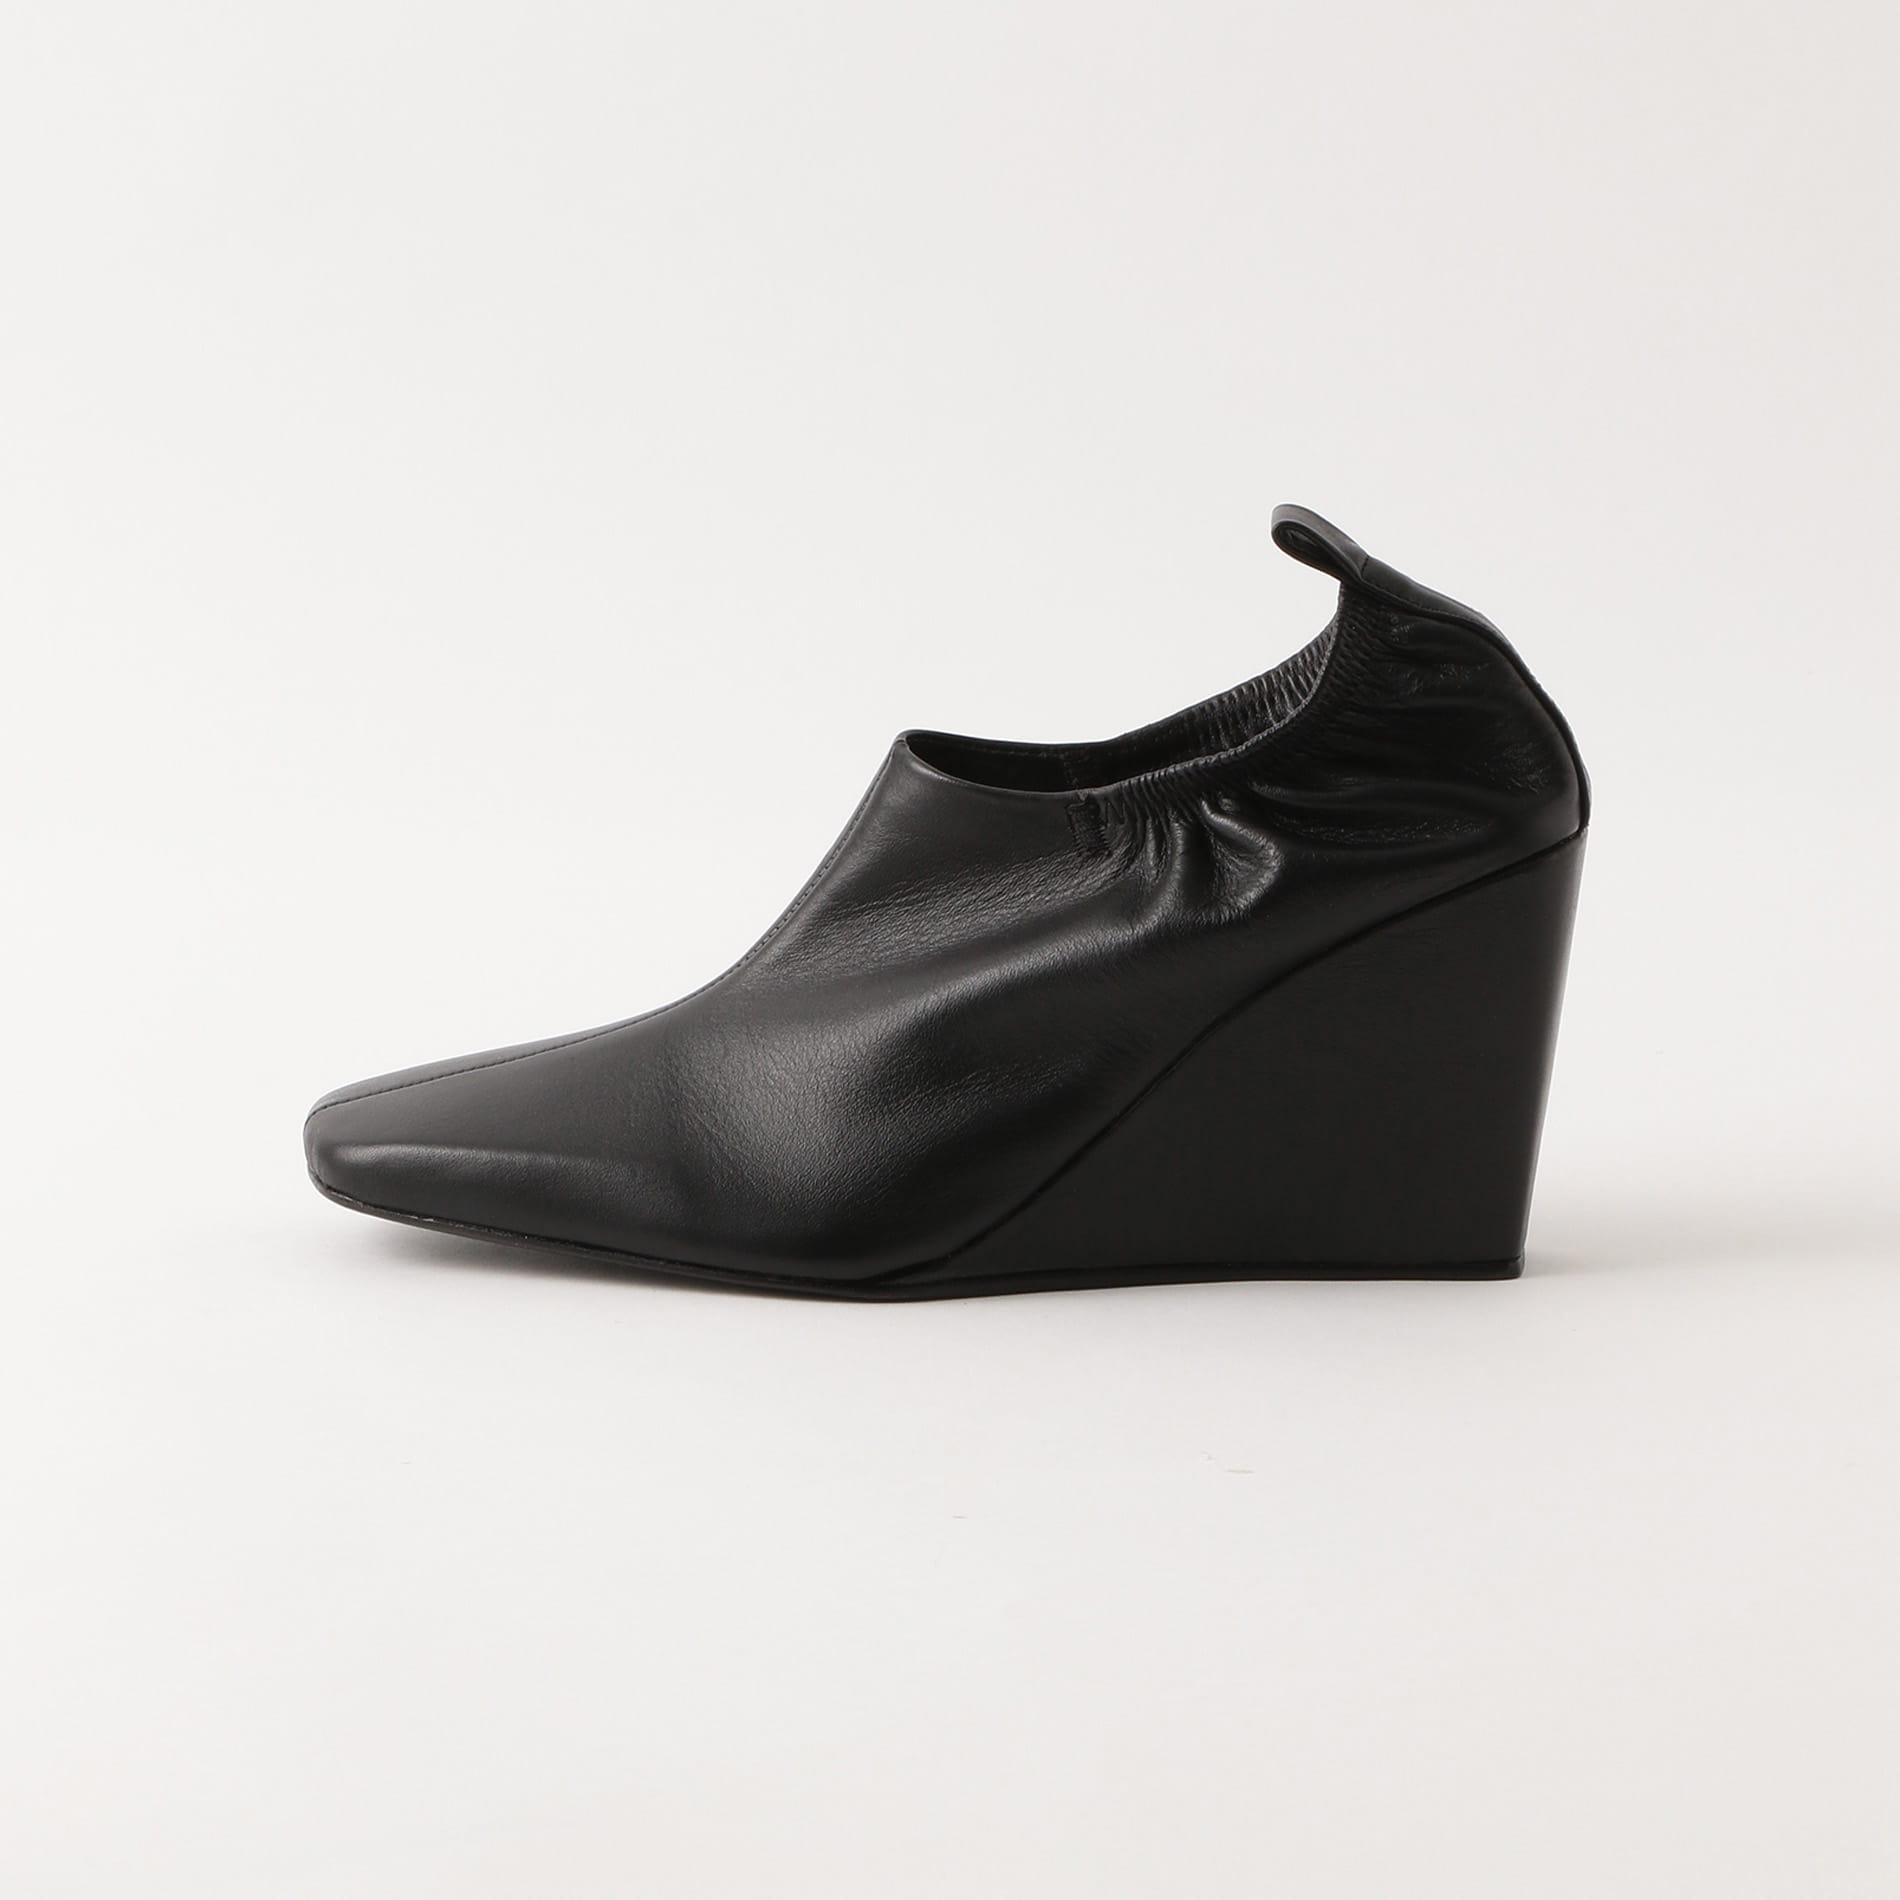 【DUBIE】WOMEN シューズ Soft napa leather Tecno High 18AW2011